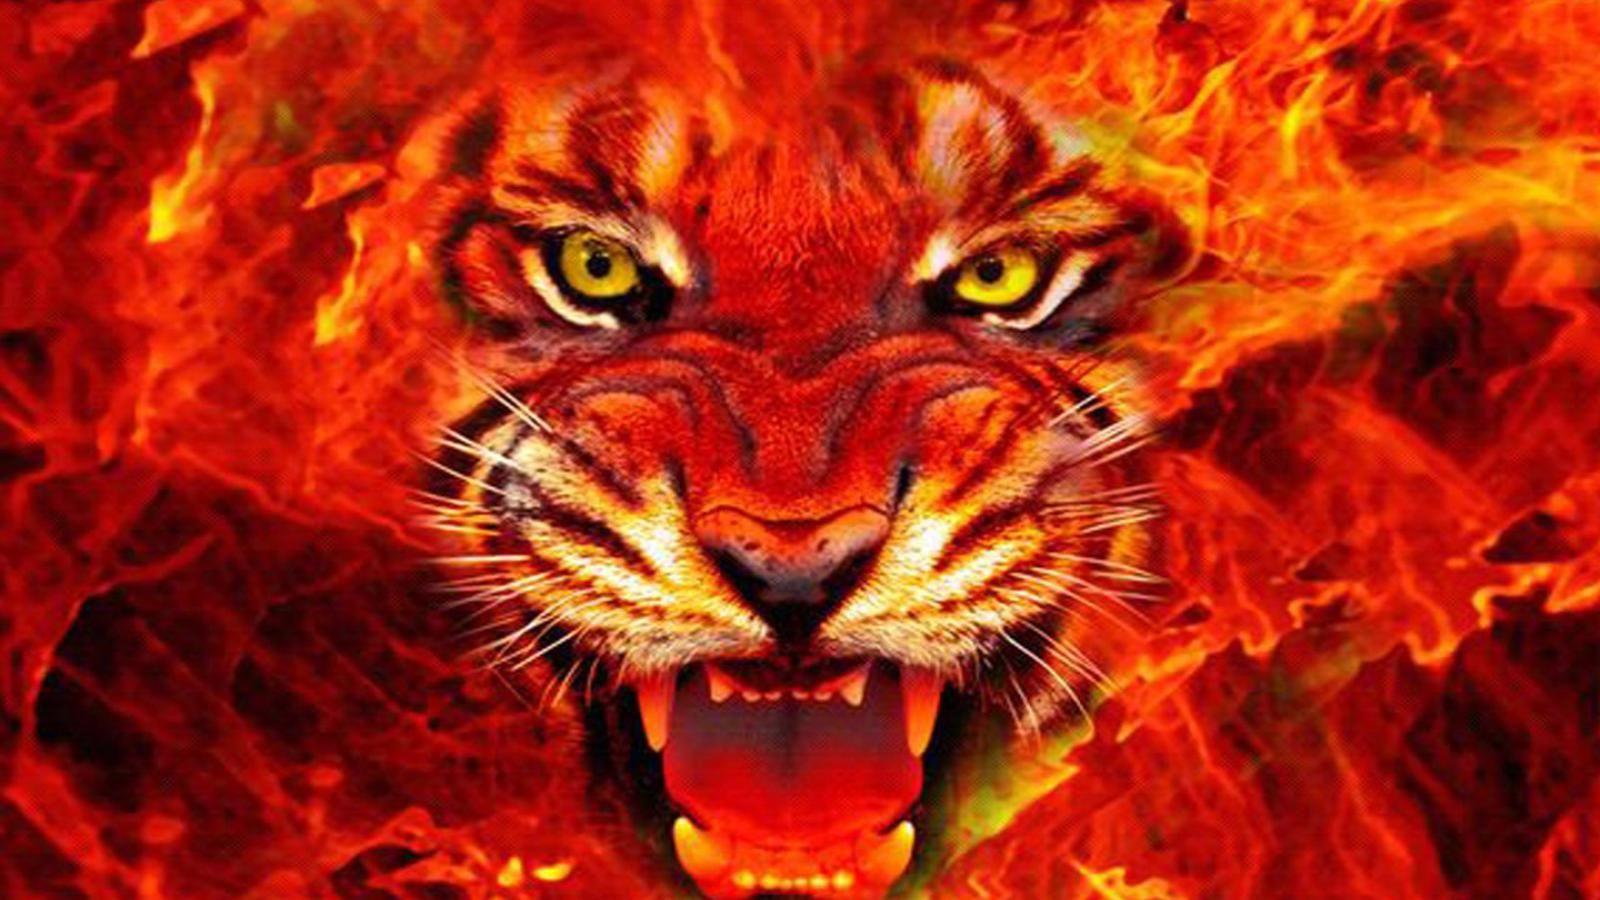 Ferocious tiger wallpaper Fire Flame Collection